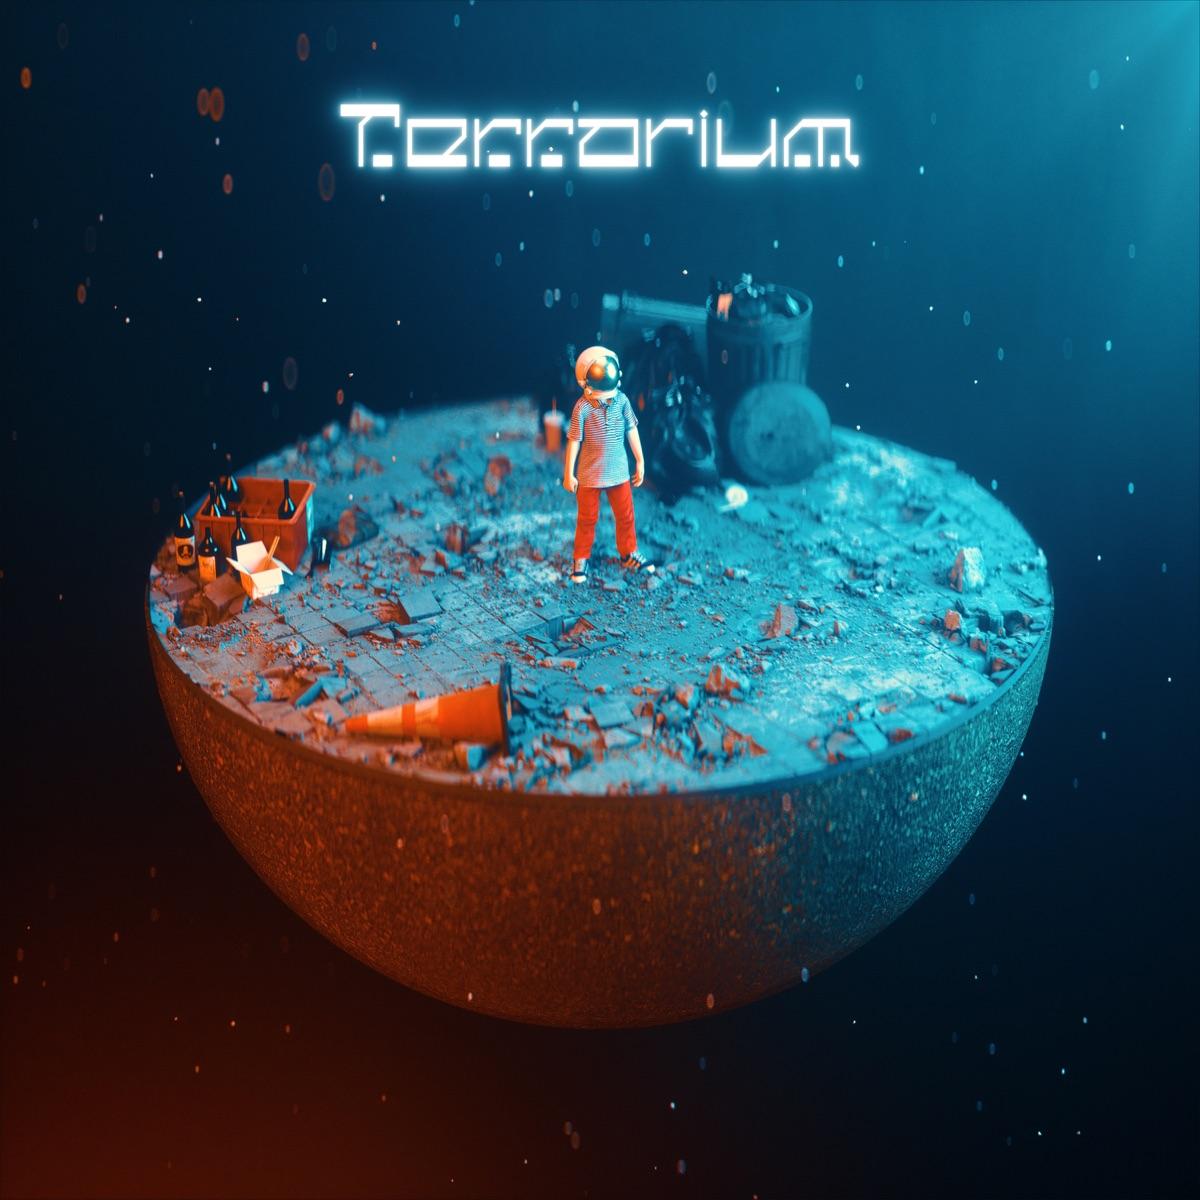 『HoneyComeBear - Terrarium』収録の『Terrarium』ジャケット